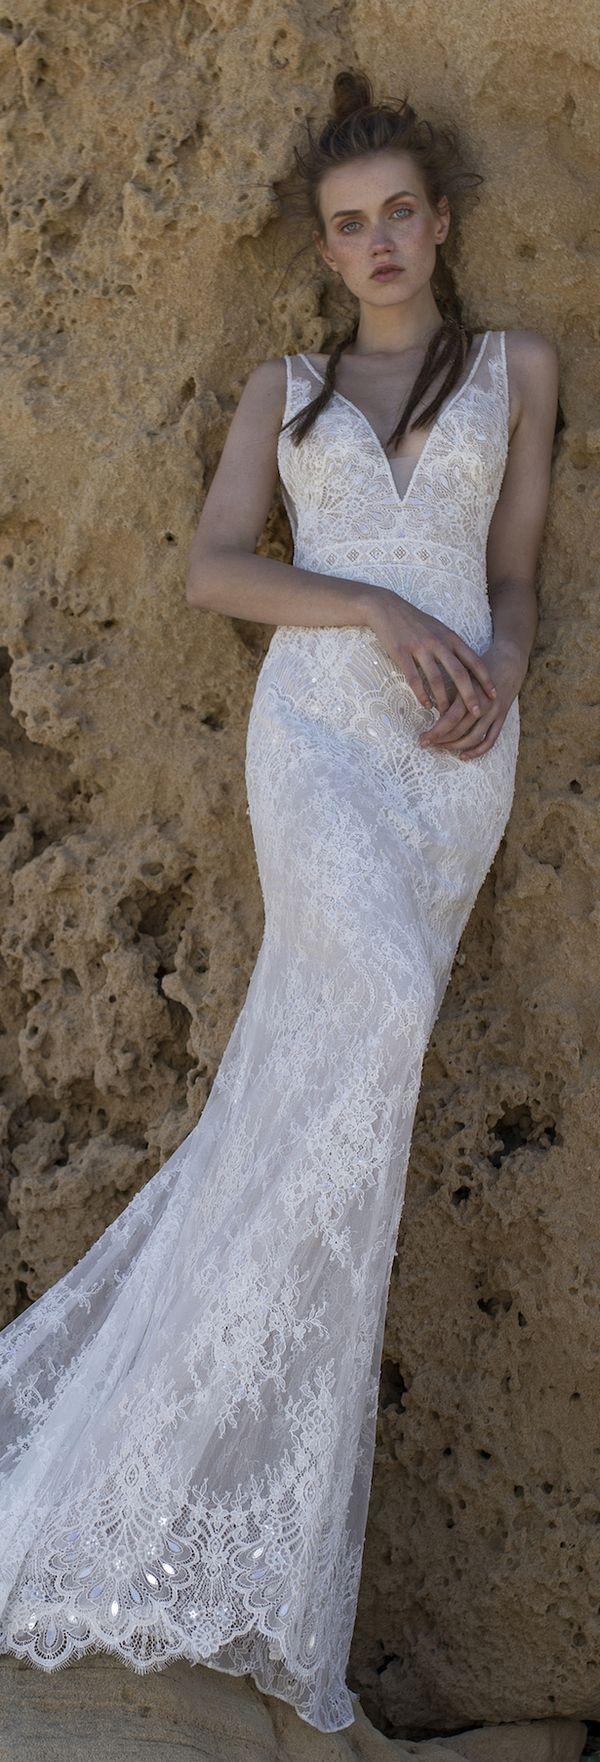 Best wedding dresses of 2018  The Best Wedding Dresses  from  Bridal Designers  novias